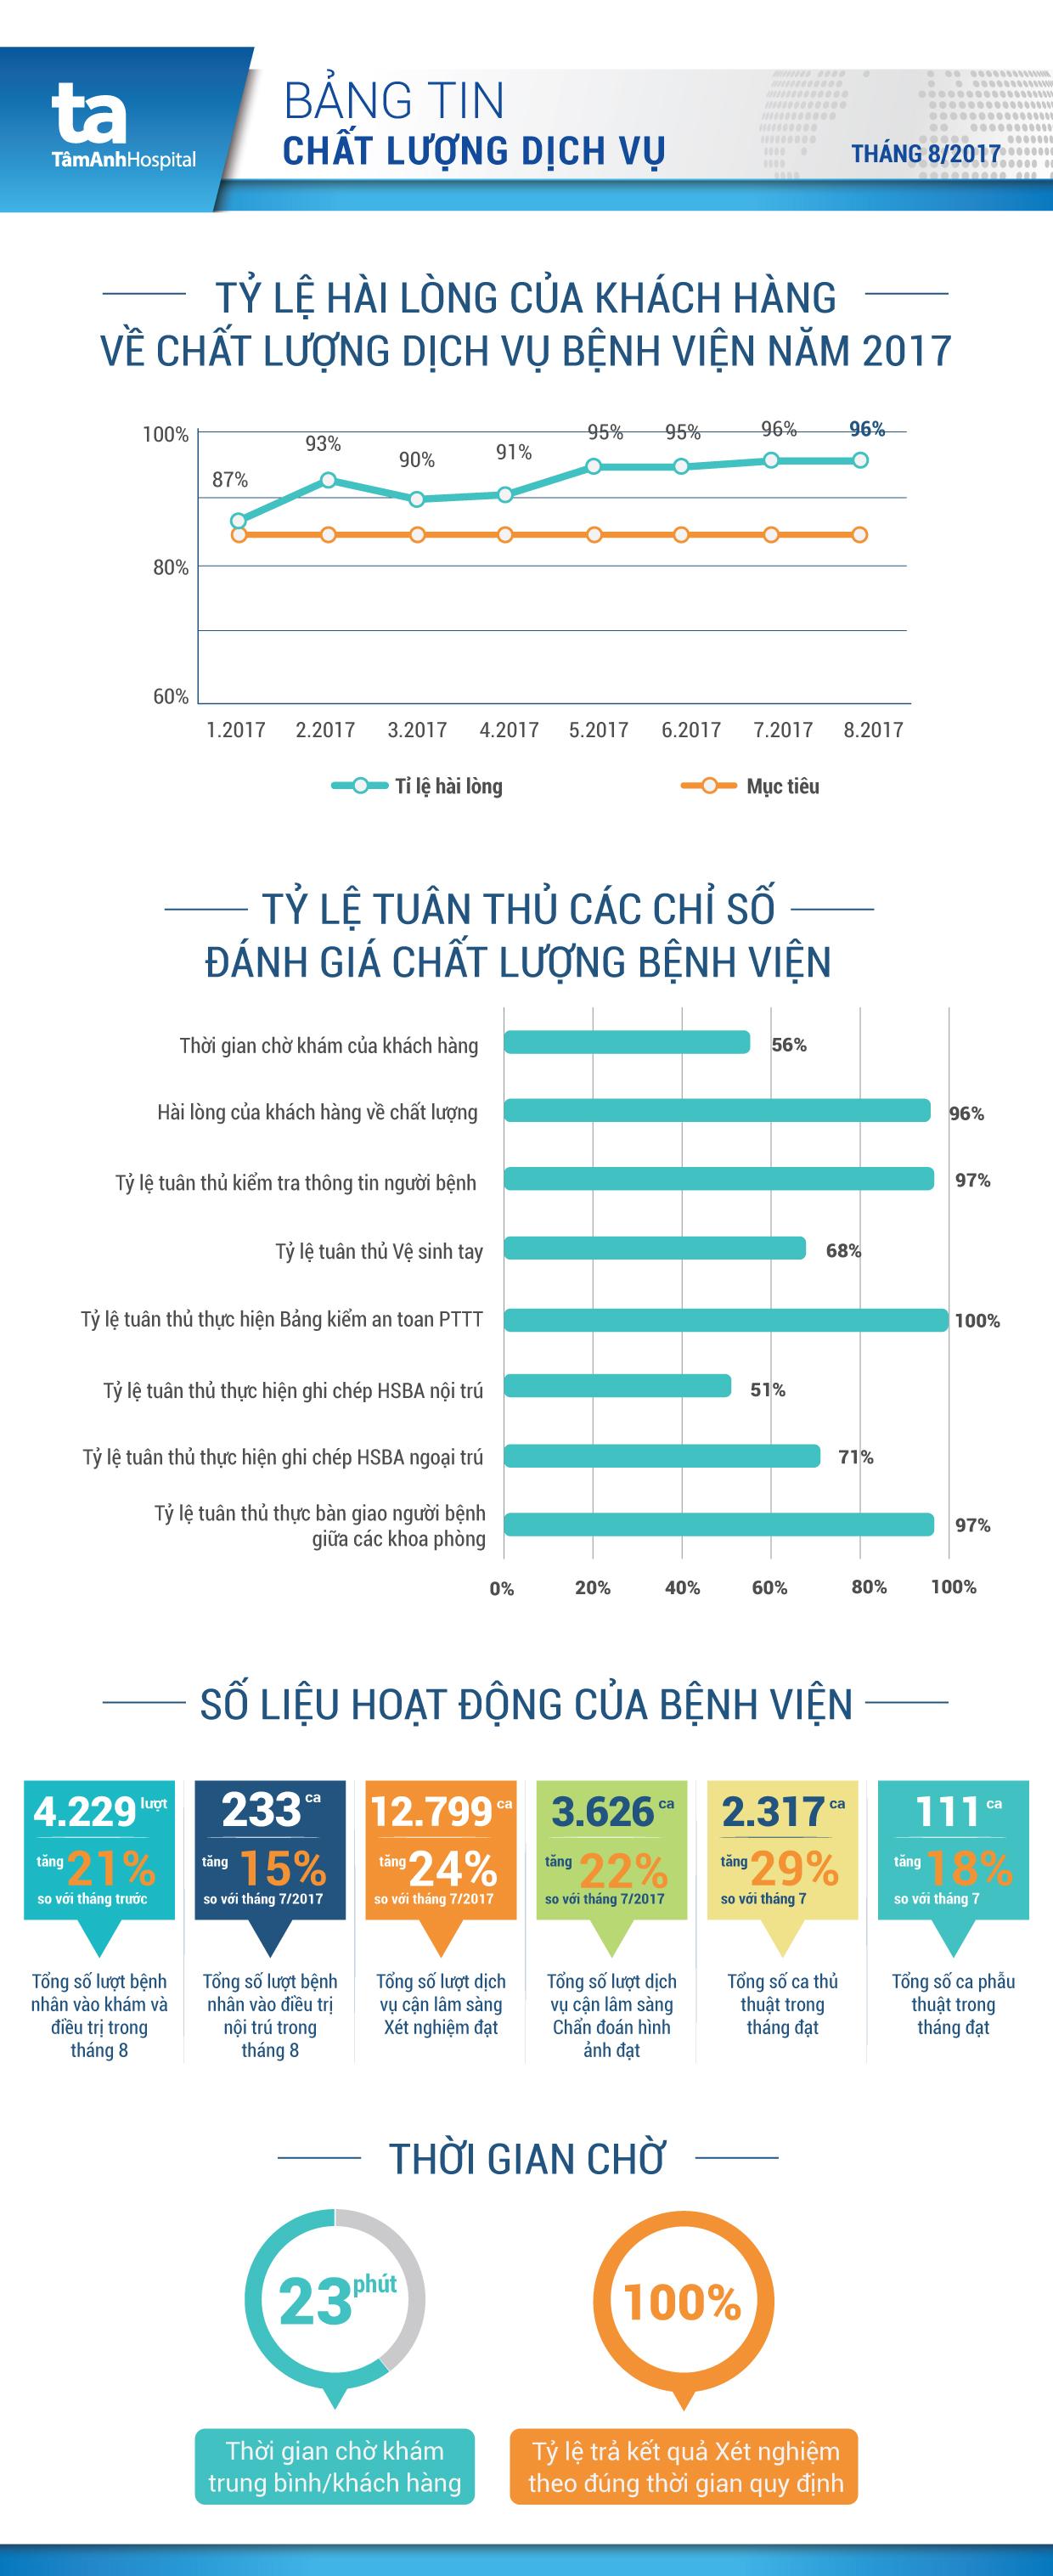 BVTA_BANTINCHATLUONG_Thang8-01